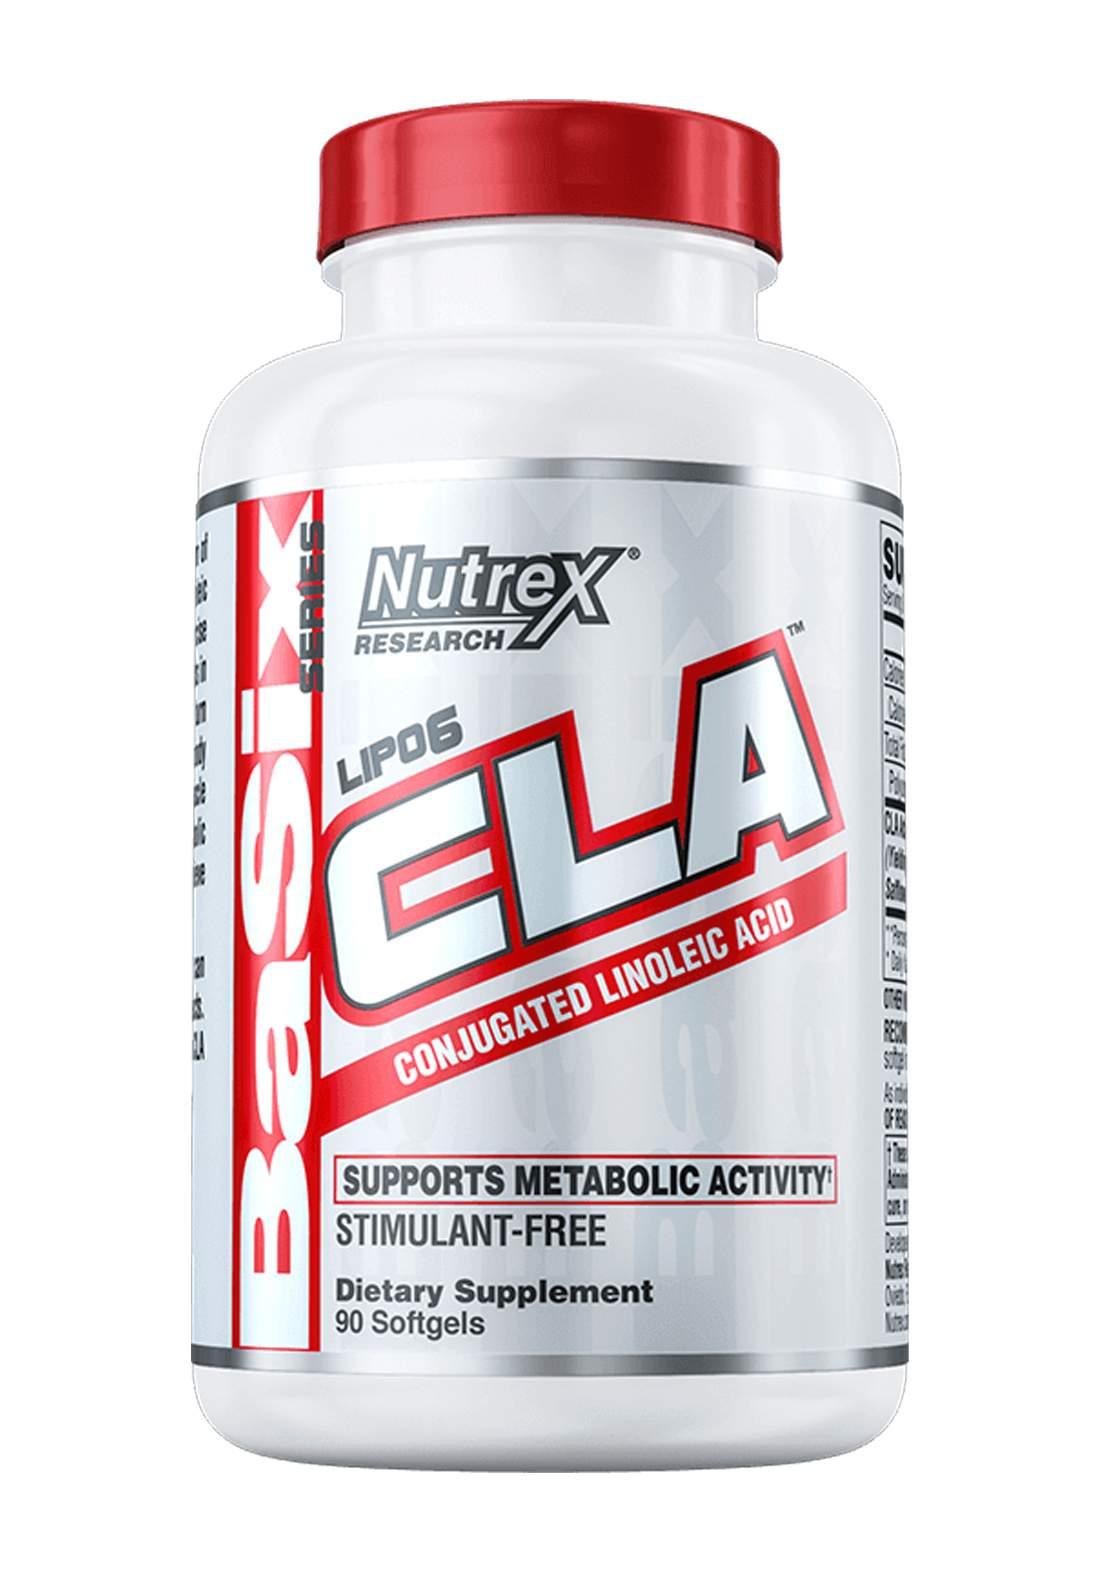 Nutrex Lipo 6  CLA Conjugated Linoleic Acid 90 Soft Gel 1000mg   مكمل غذائي لانقاص الوزن